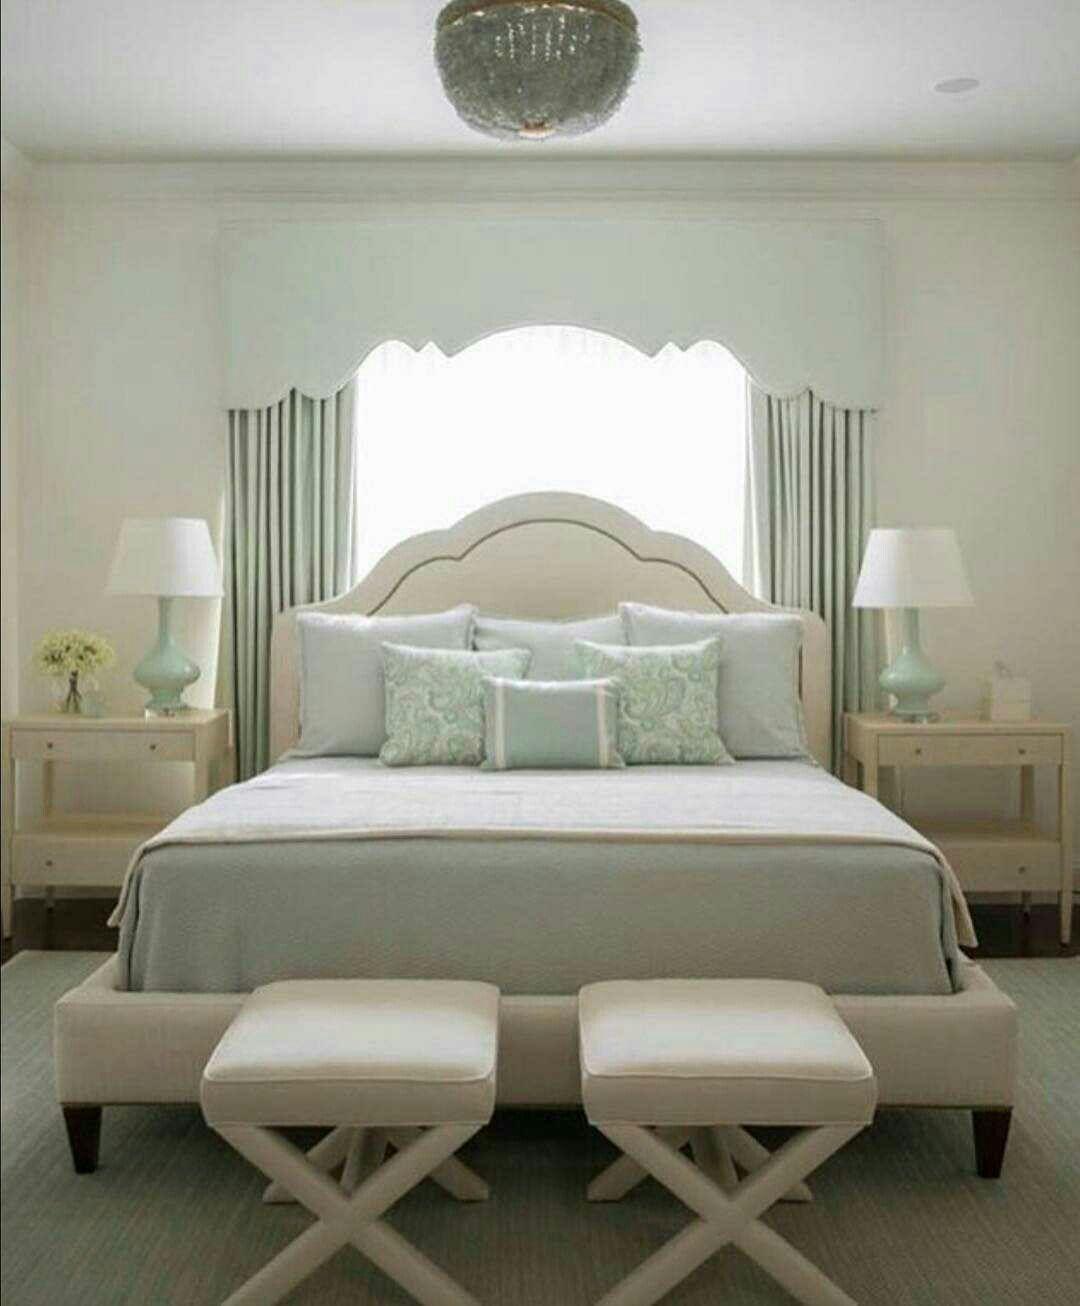 Pin By Natalya Avs On Bedroom 2 Master Bedrooms Decor Small